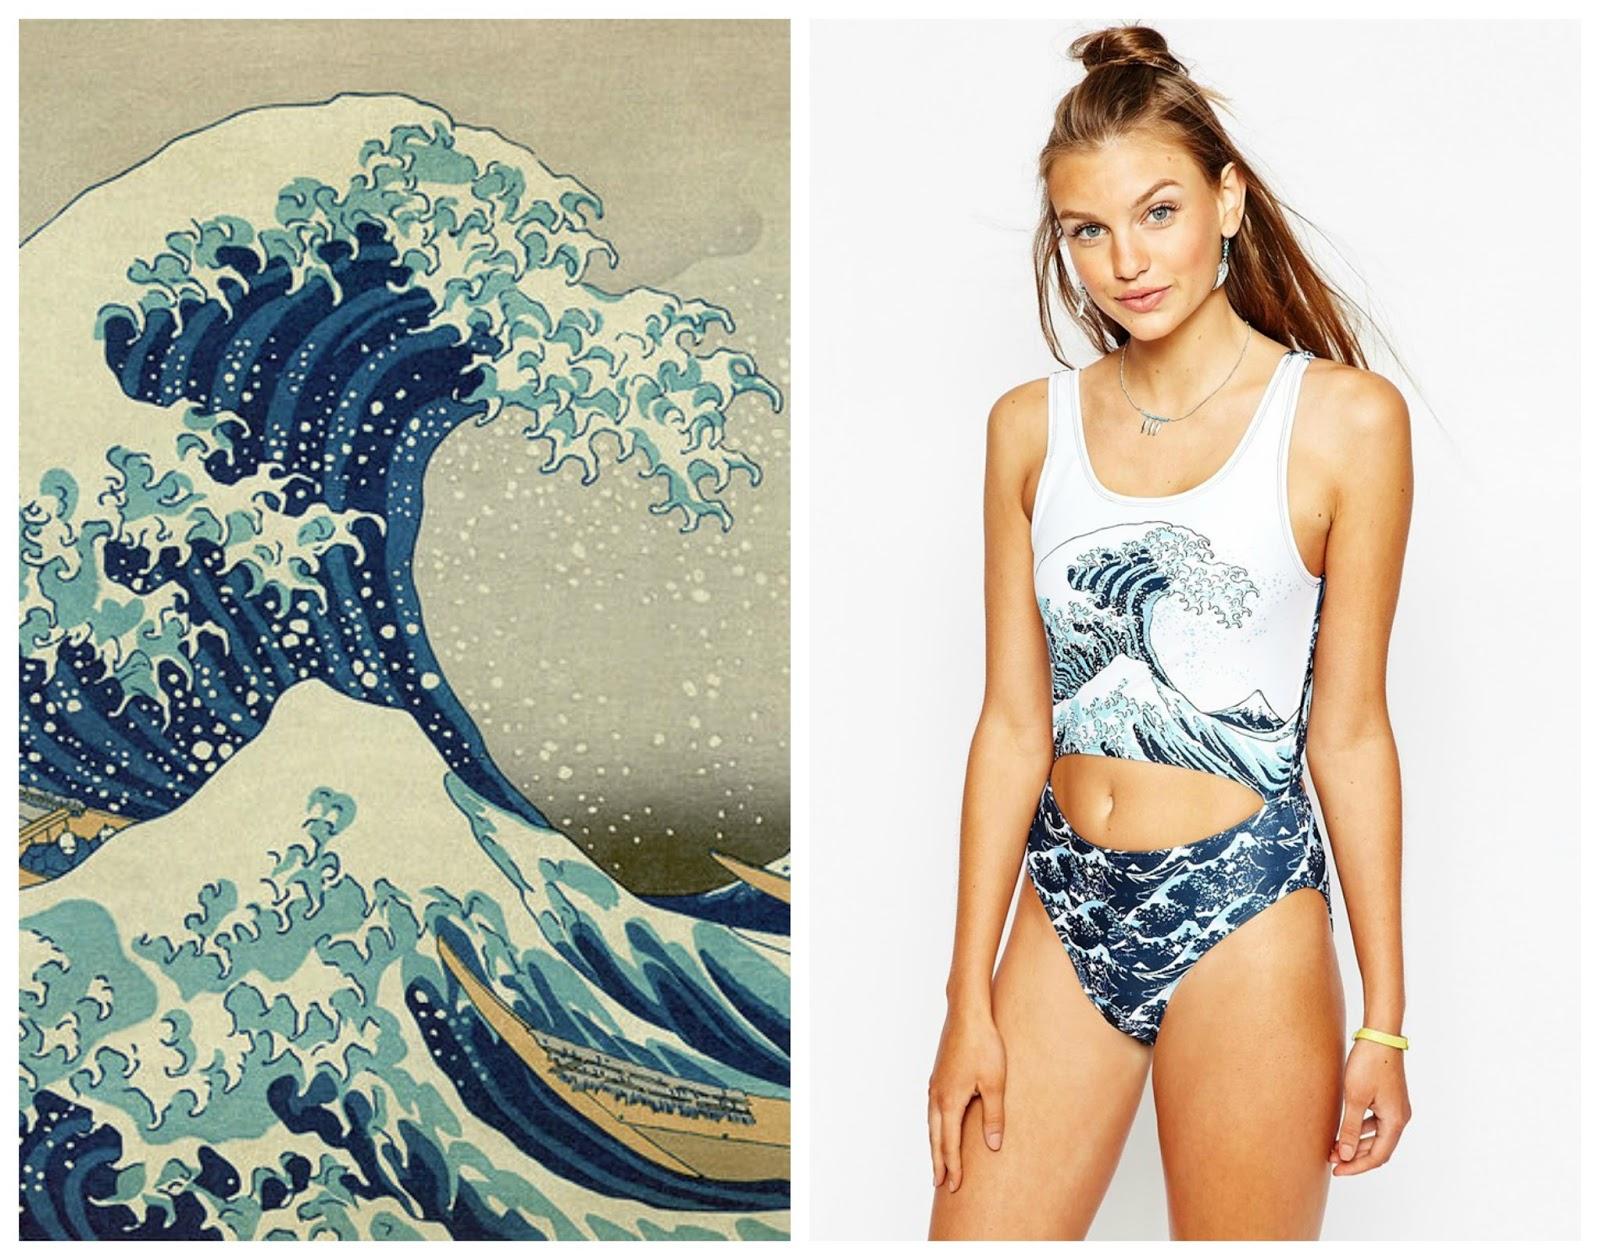 great-wave-kanagawa-vs-motel-swimsuit.jpg